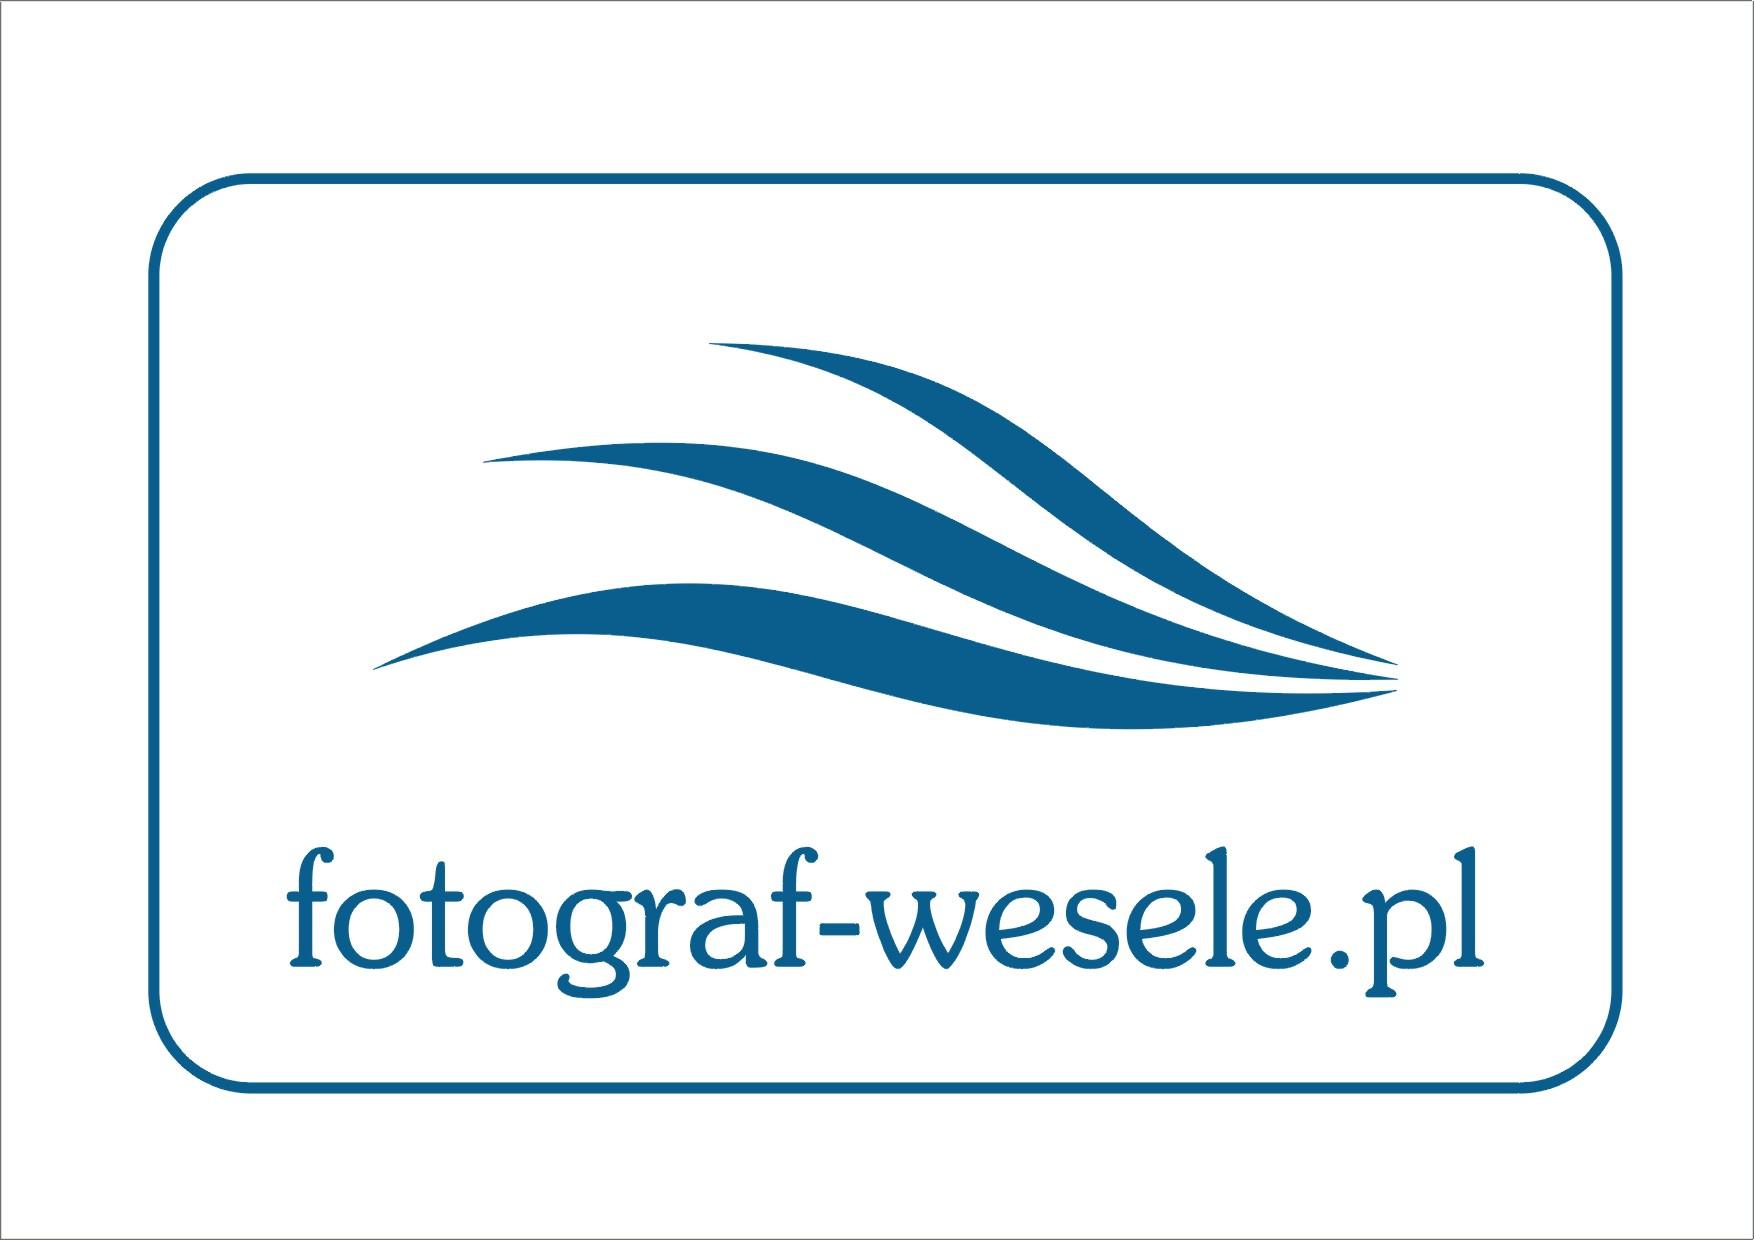 www.fotograf-wesele.pl